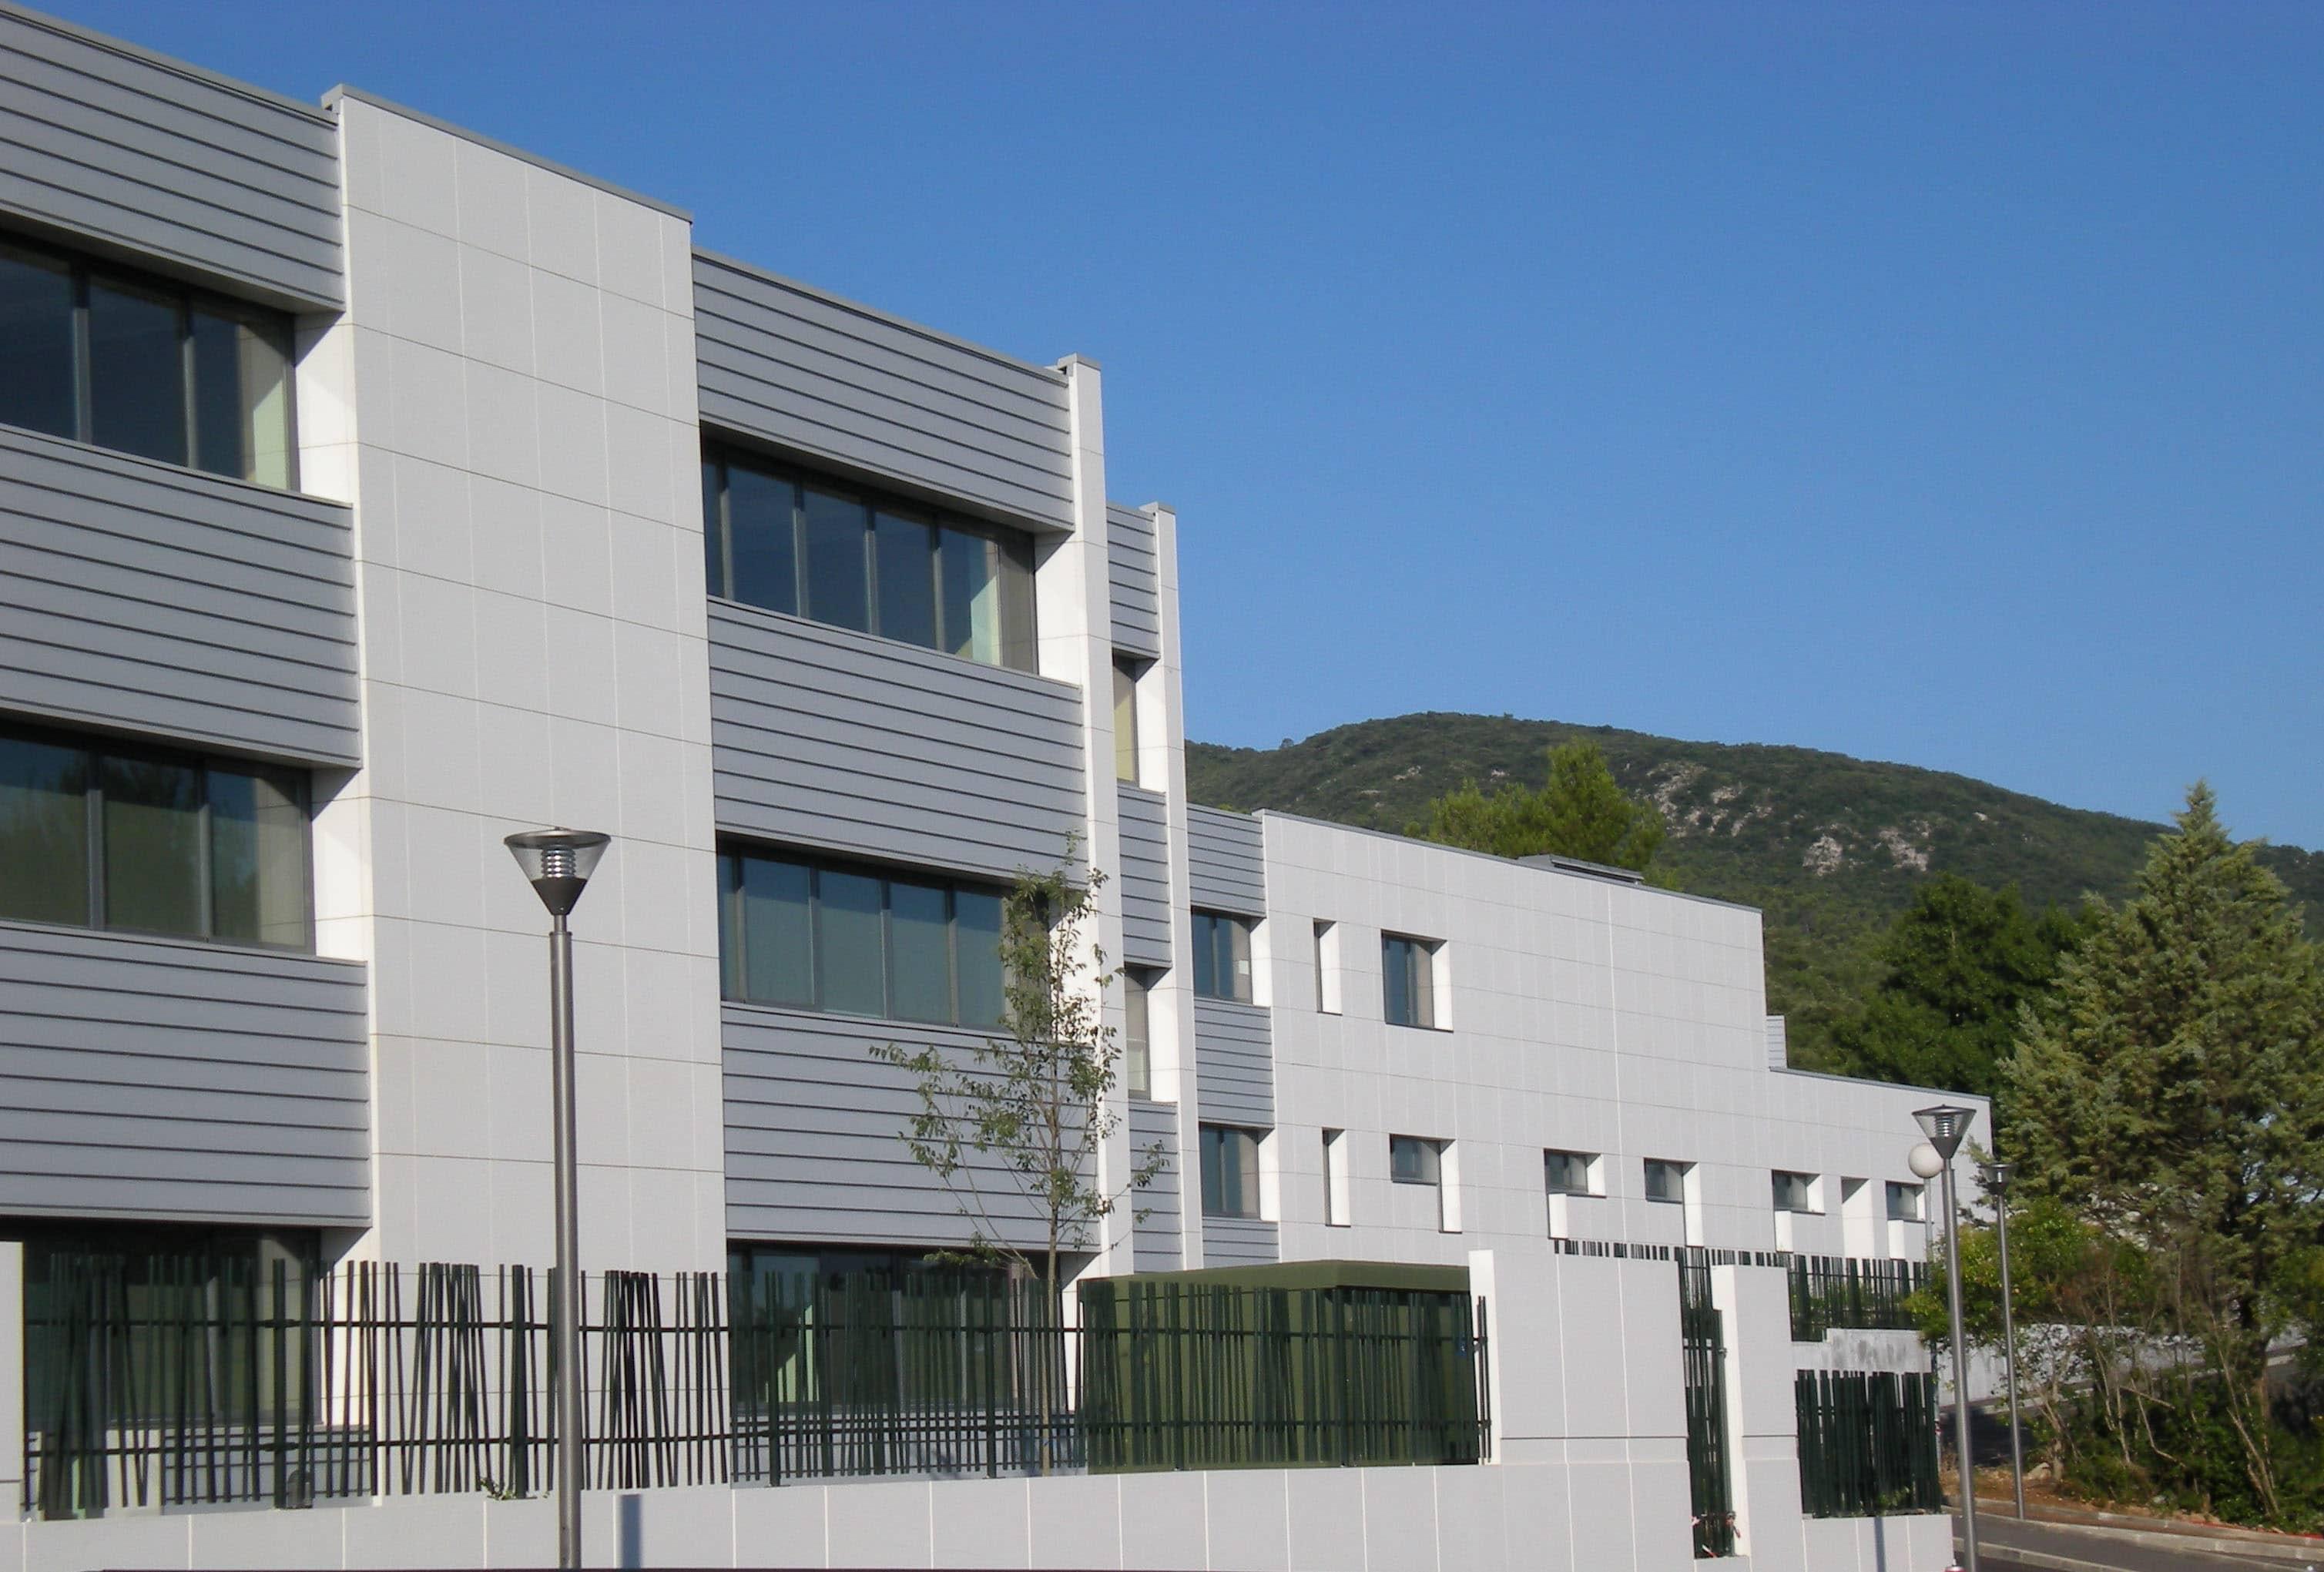 Façade Collège Saint Maximin - AAPL Architecte DPLG VAR